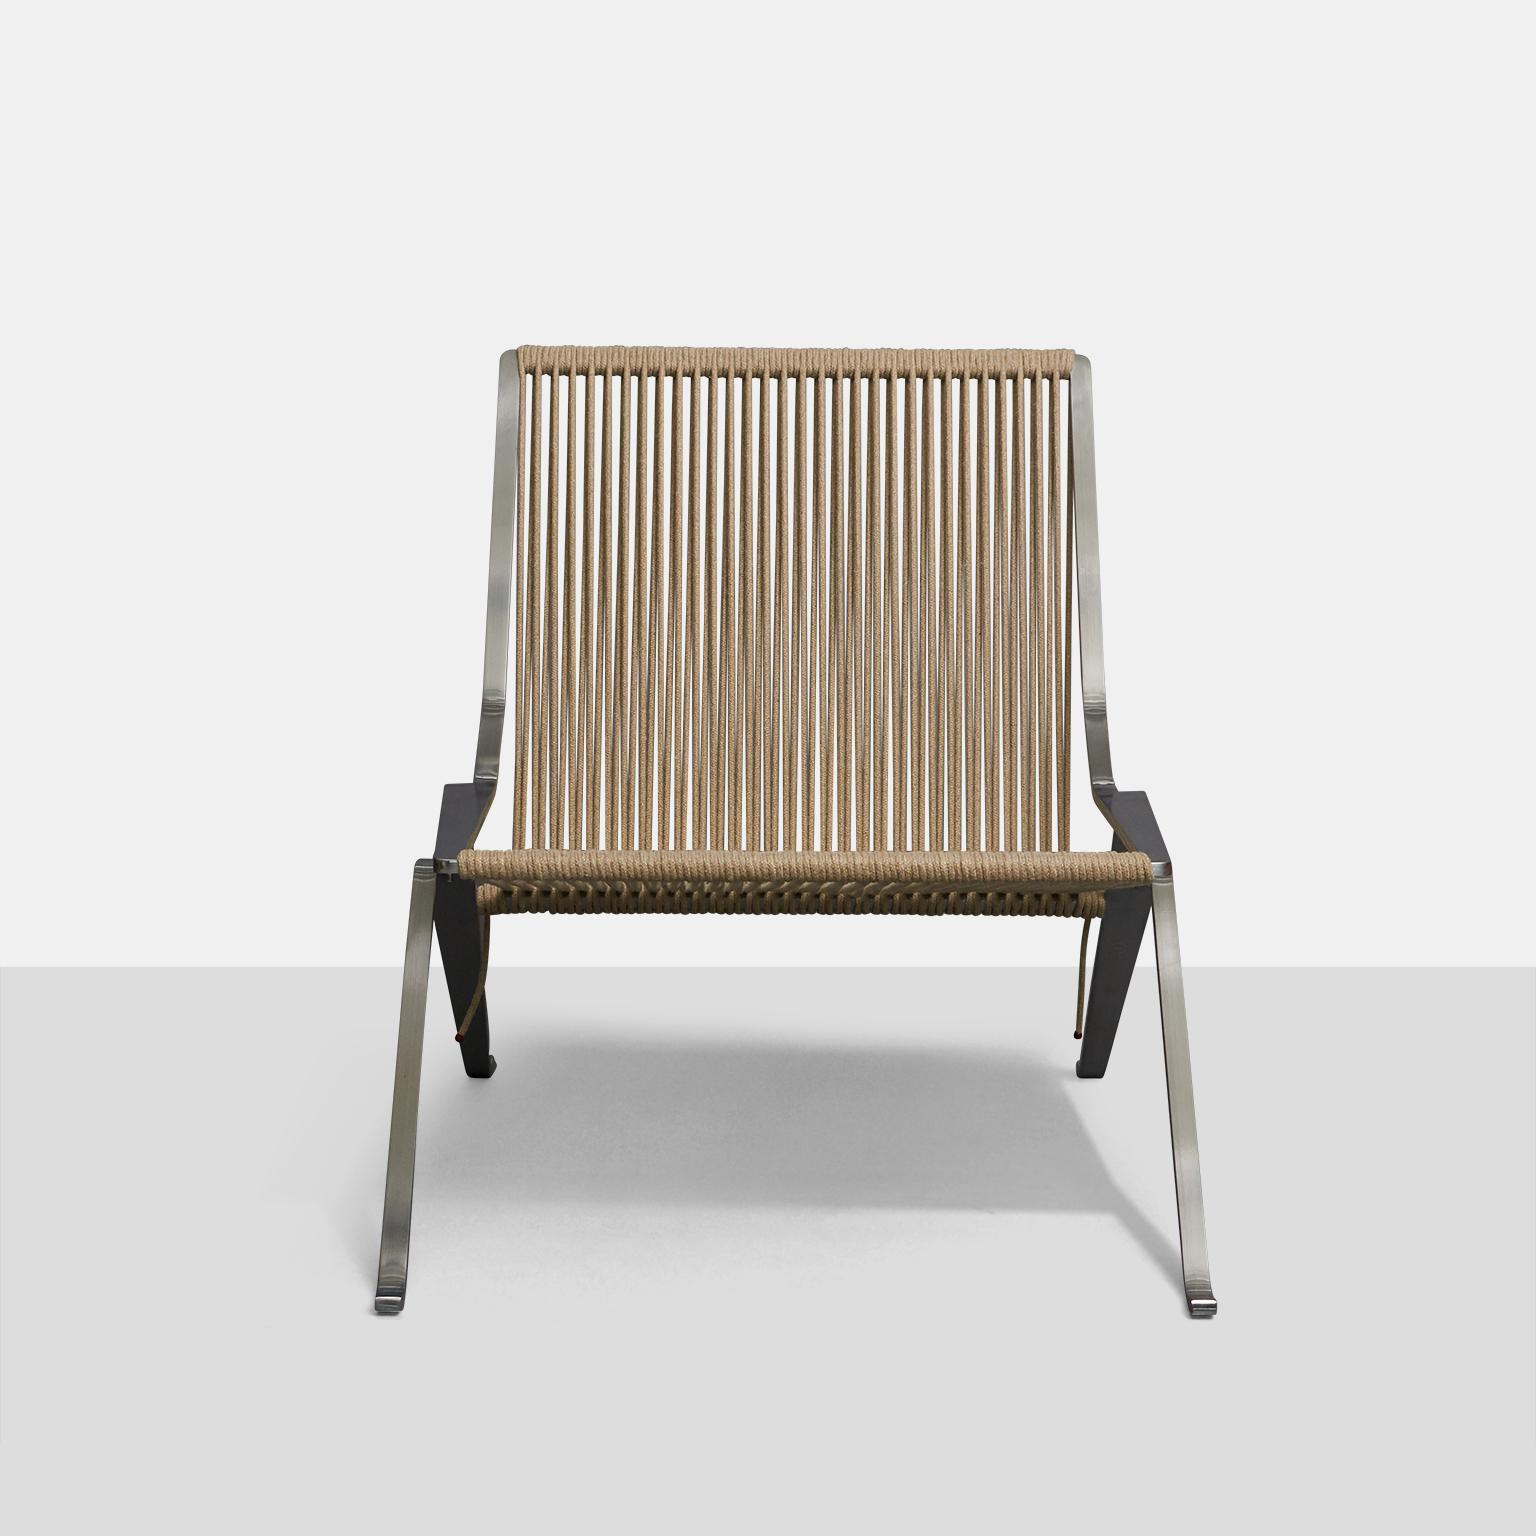 Poul Kjaerholm Pk 25 Lounge Chair   Image 6 Of 6